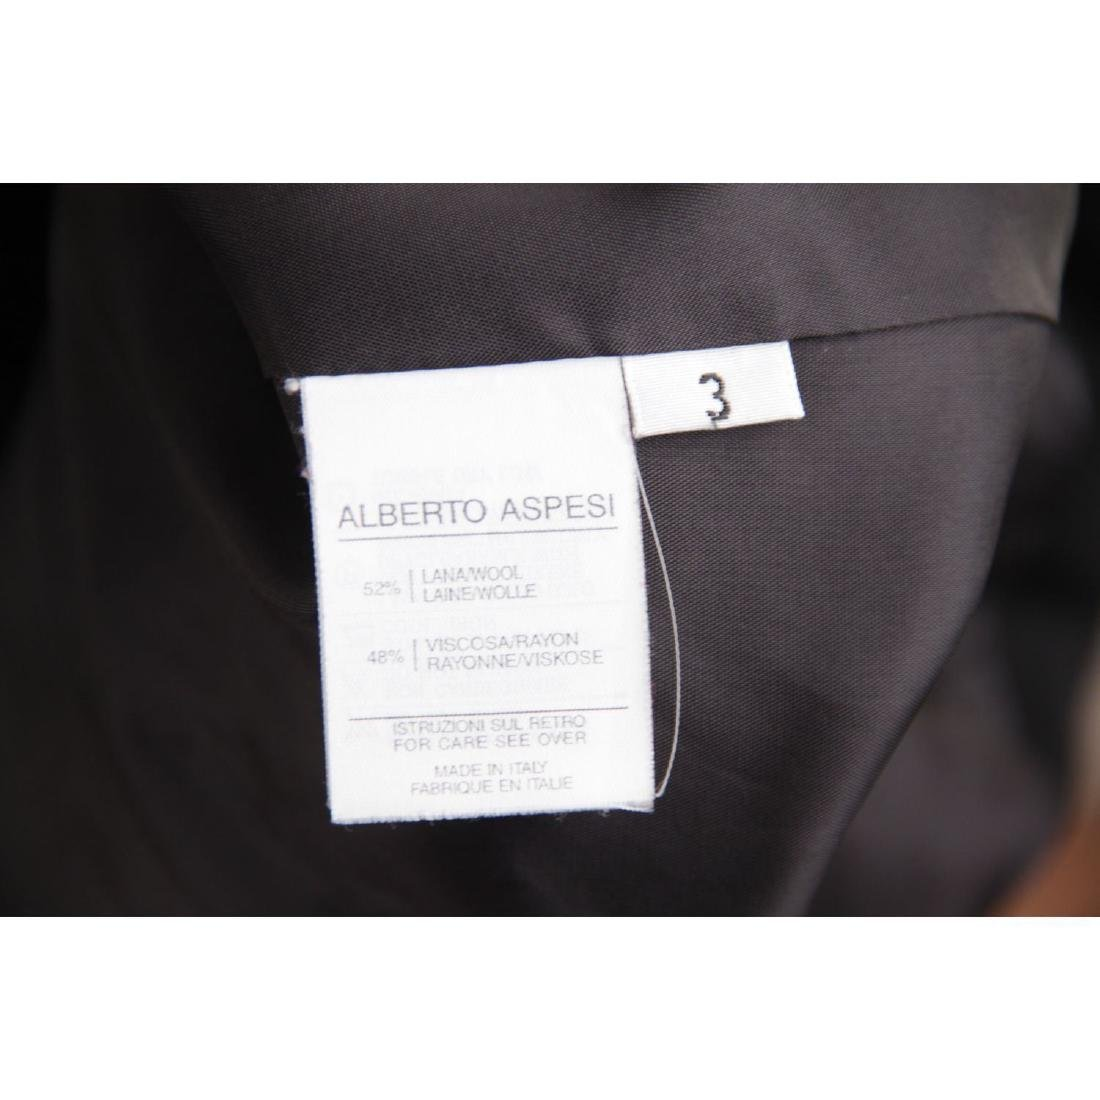 ASPESI BLU Black Wool Blend SUIT BLAZER Jacket And - 7